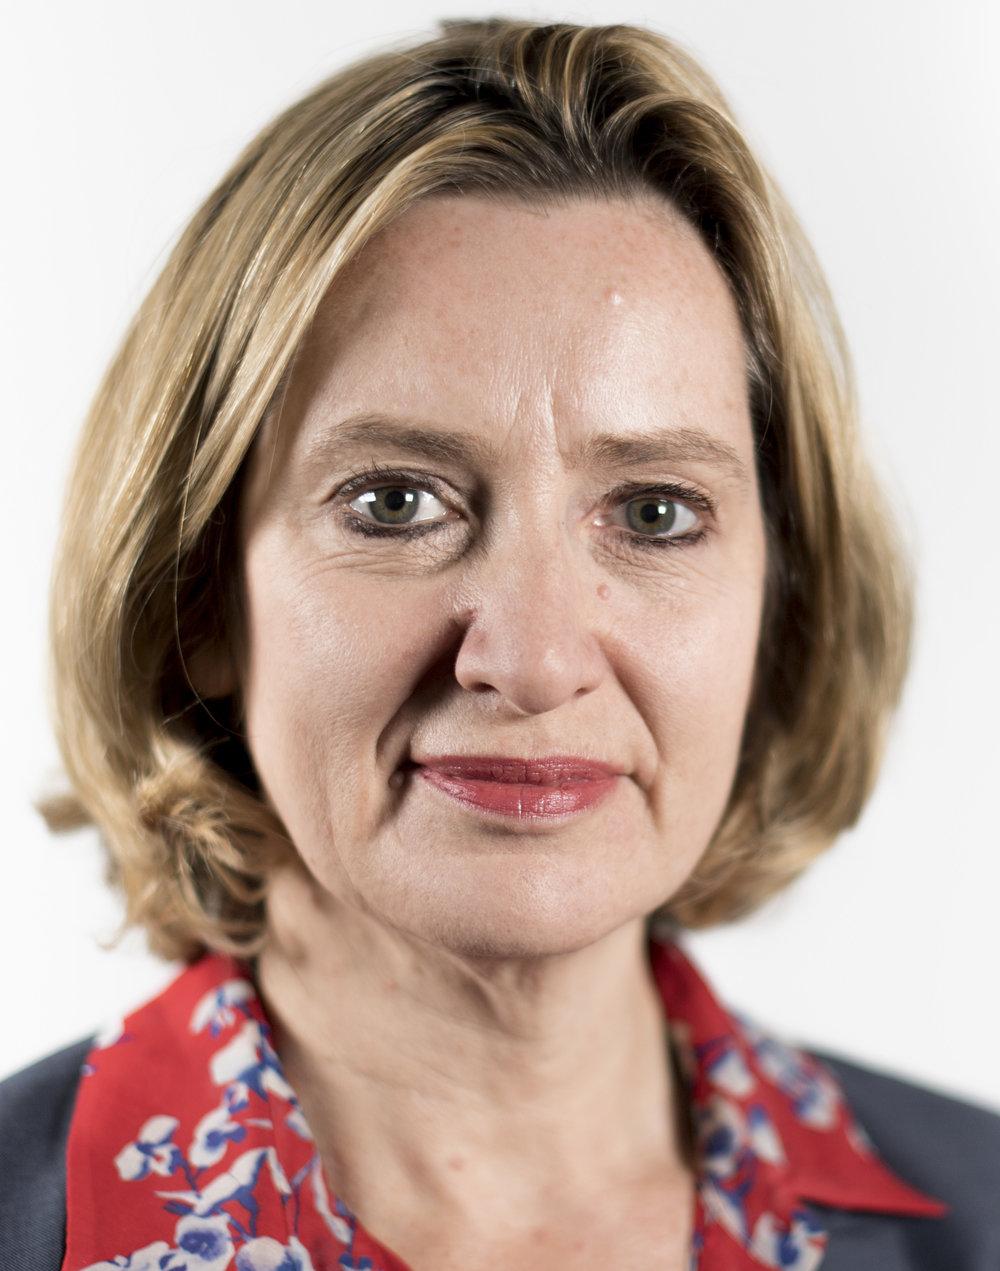 United Kingdom Home Secretary Amber Rudd. Credit: Government of UK via Wikimedia Commons.